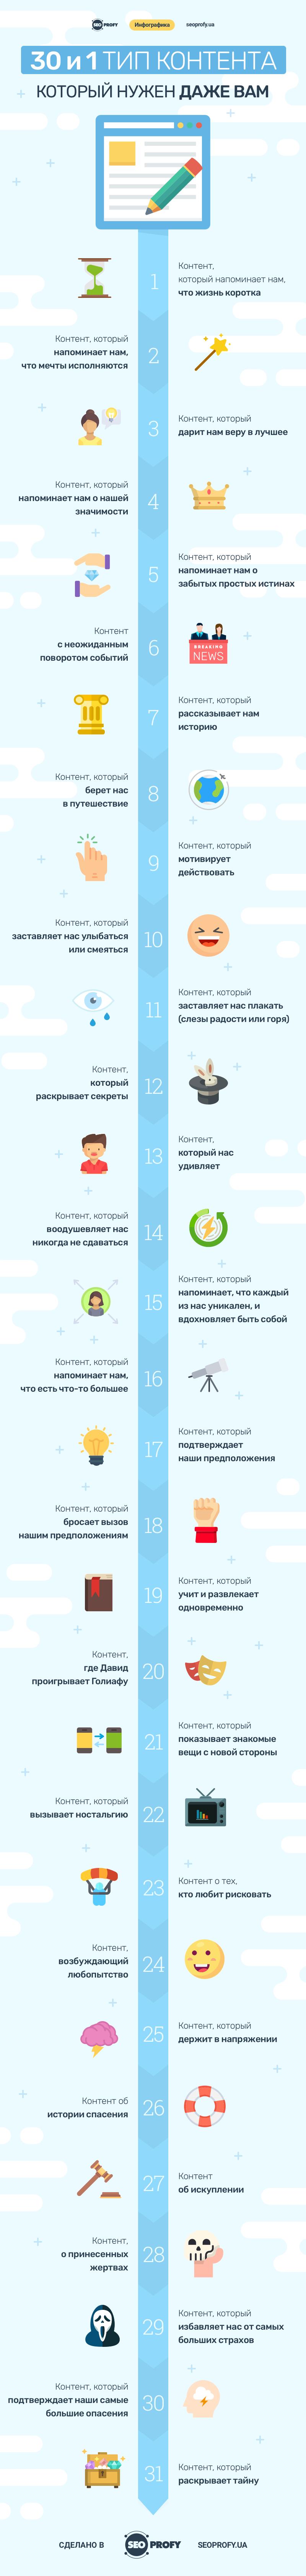 Инфографика: 30 и 1 тип контента, который нужен даже вам